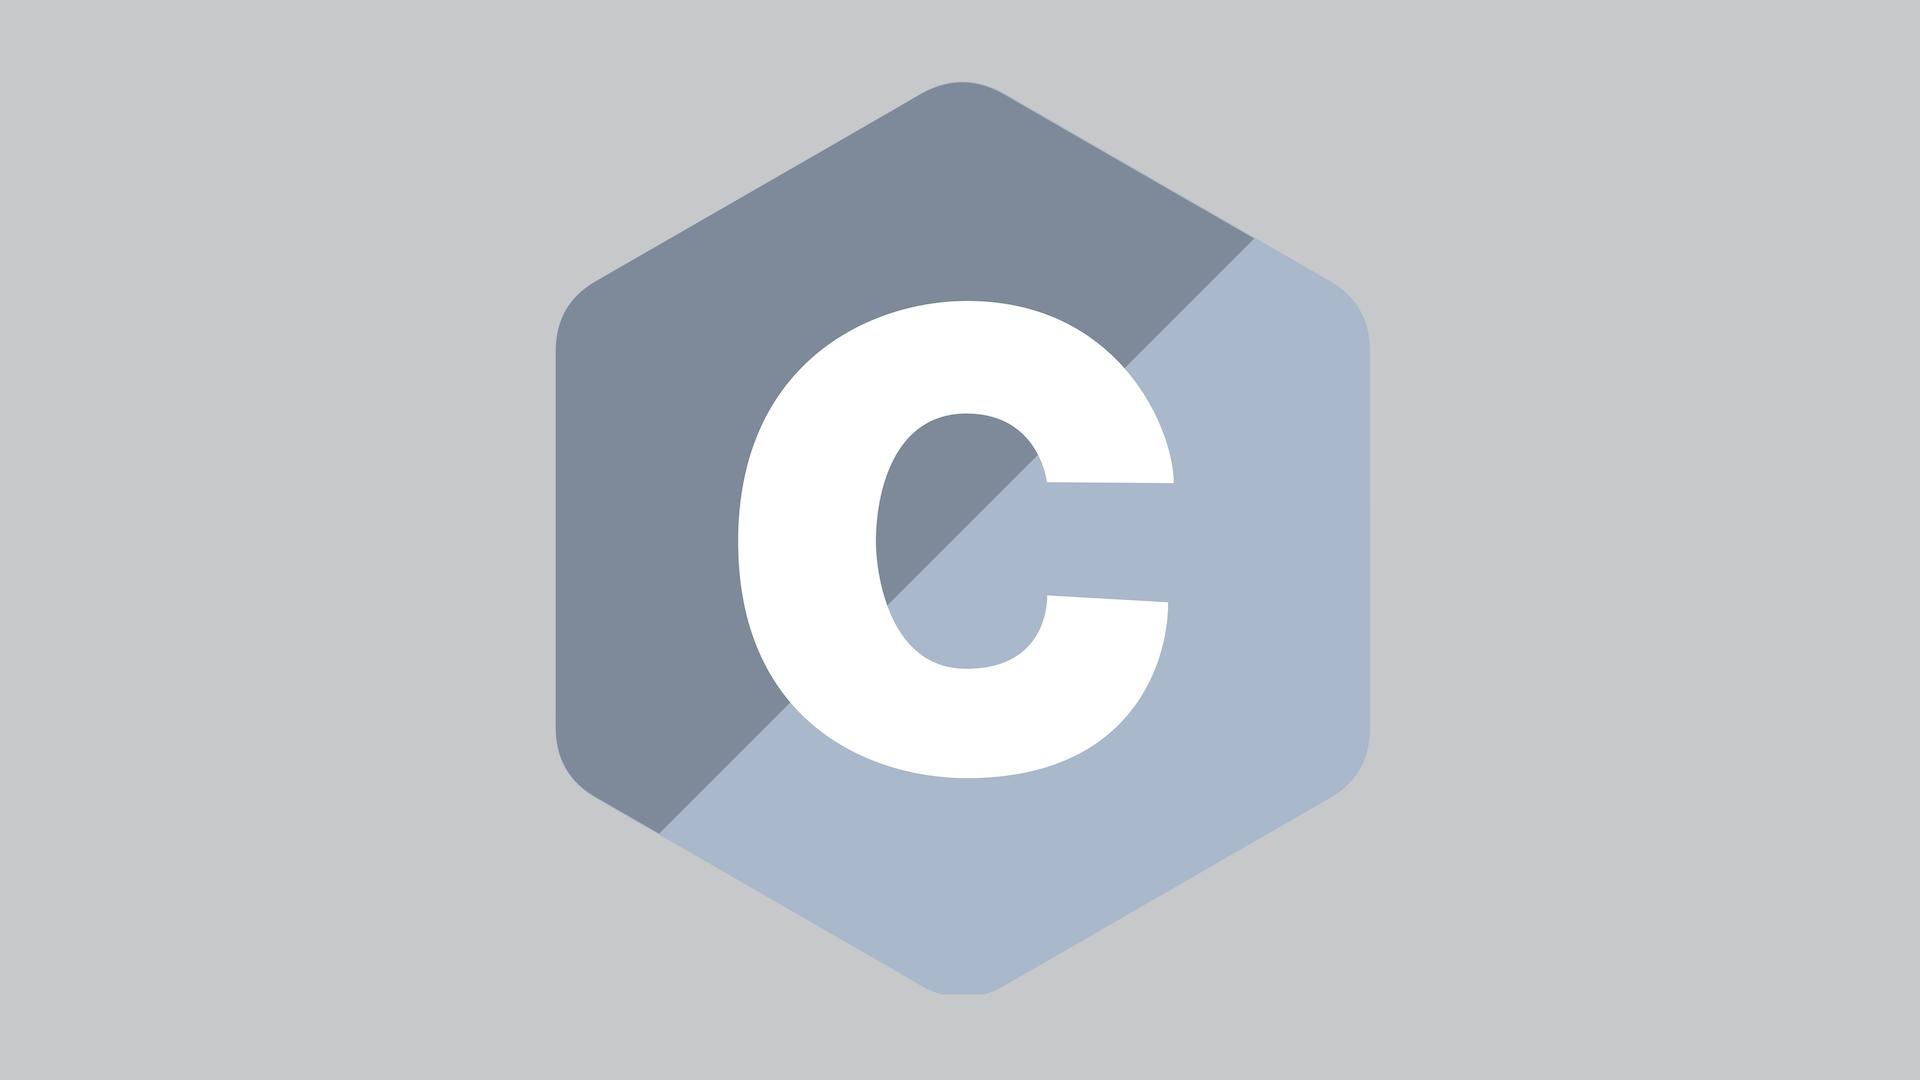 C言語プログラミング Step1